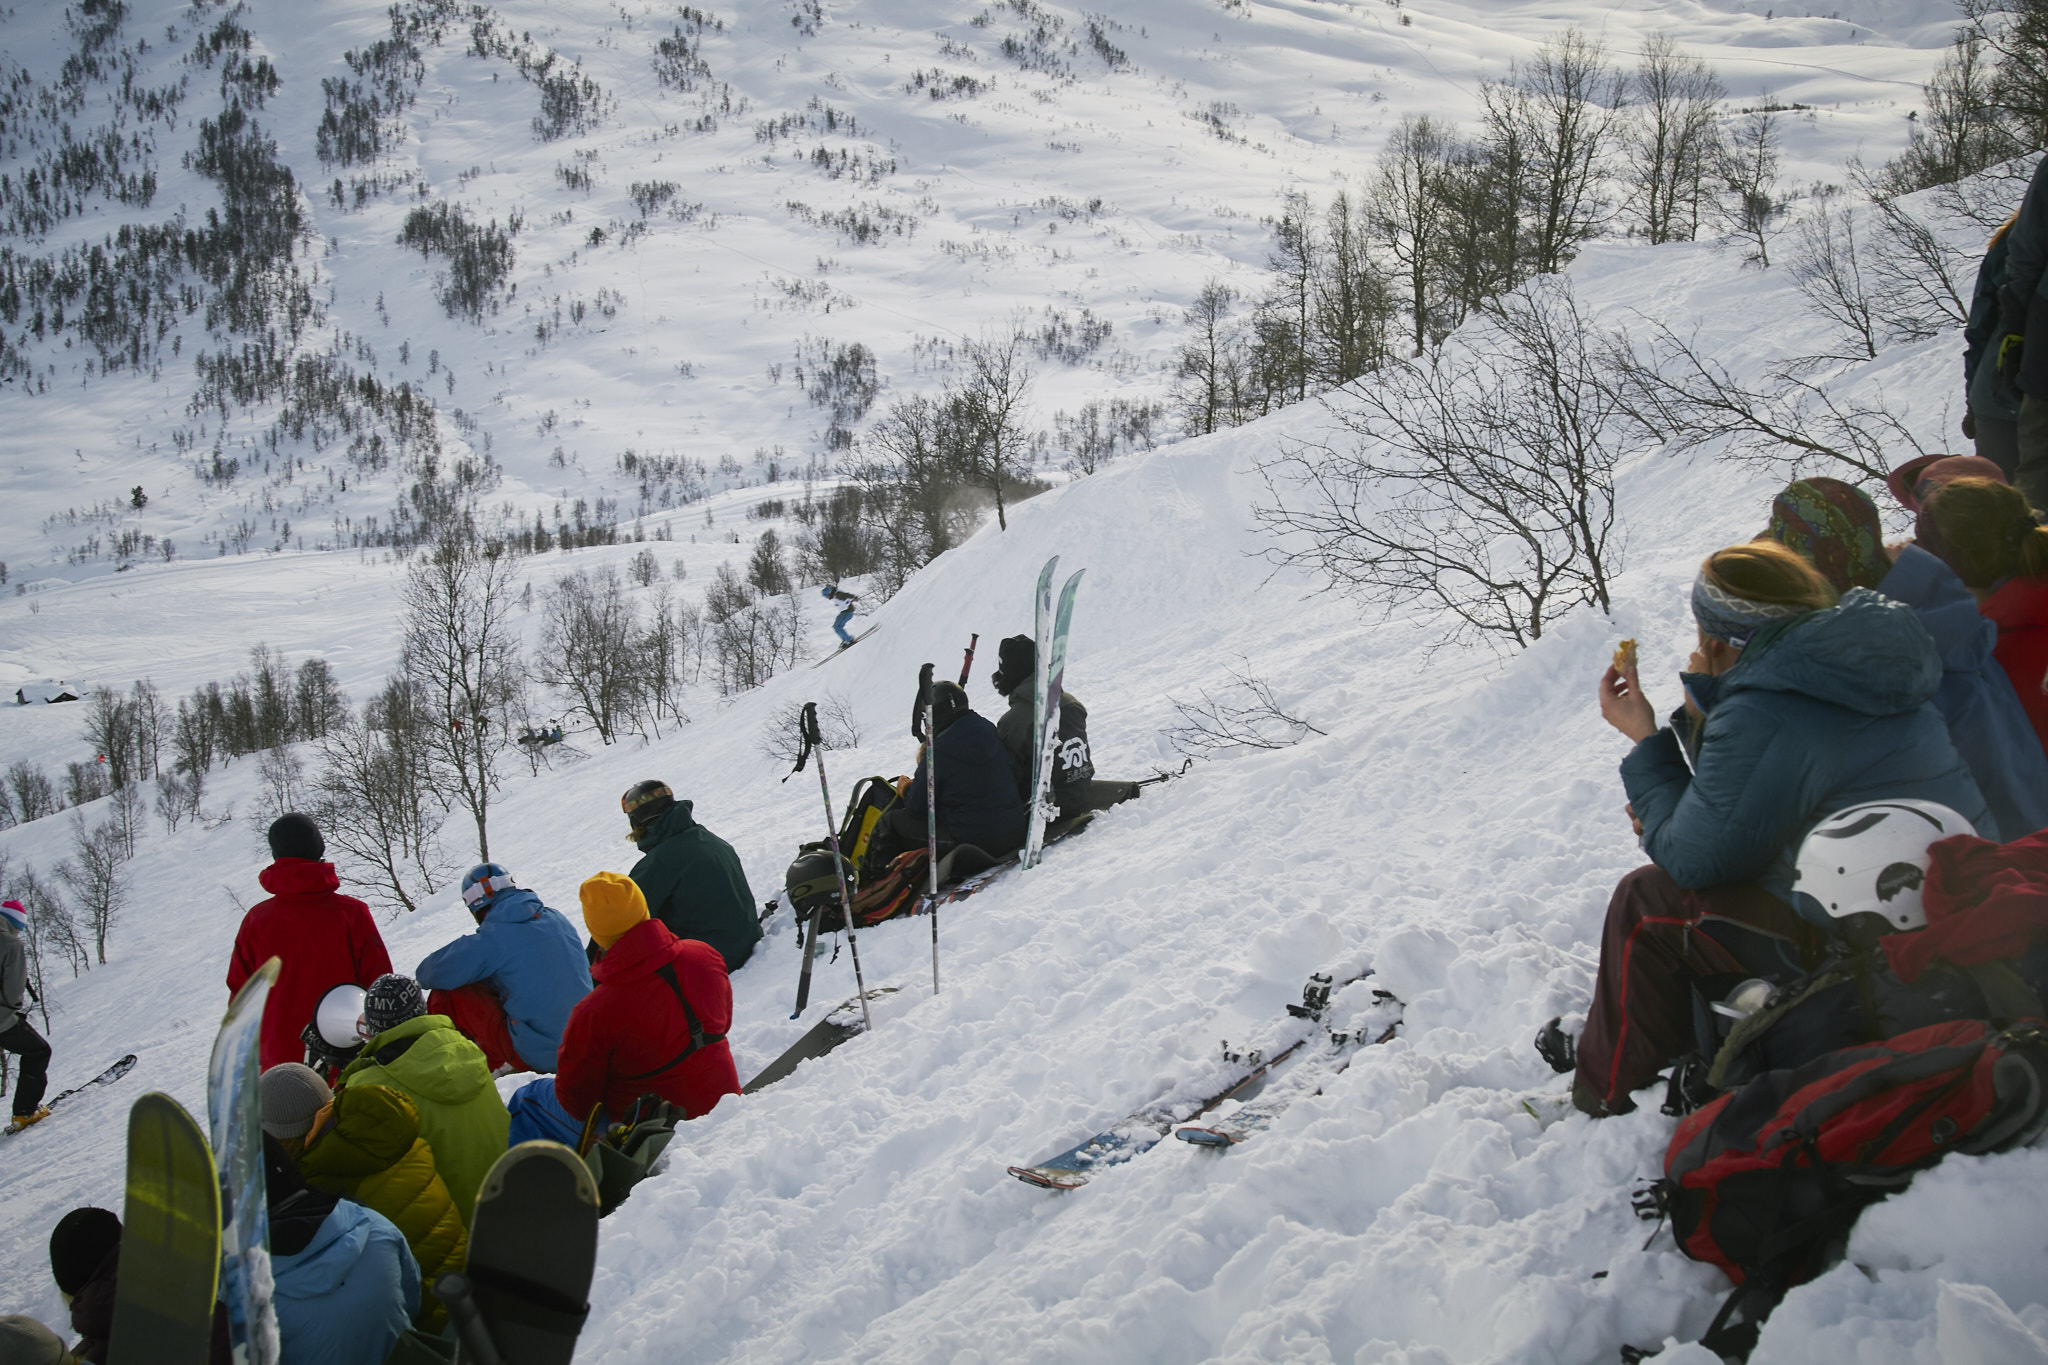 2018.02.22-Fjellsportfestival-RakkarOpen-PetterOlsen-007.jpg